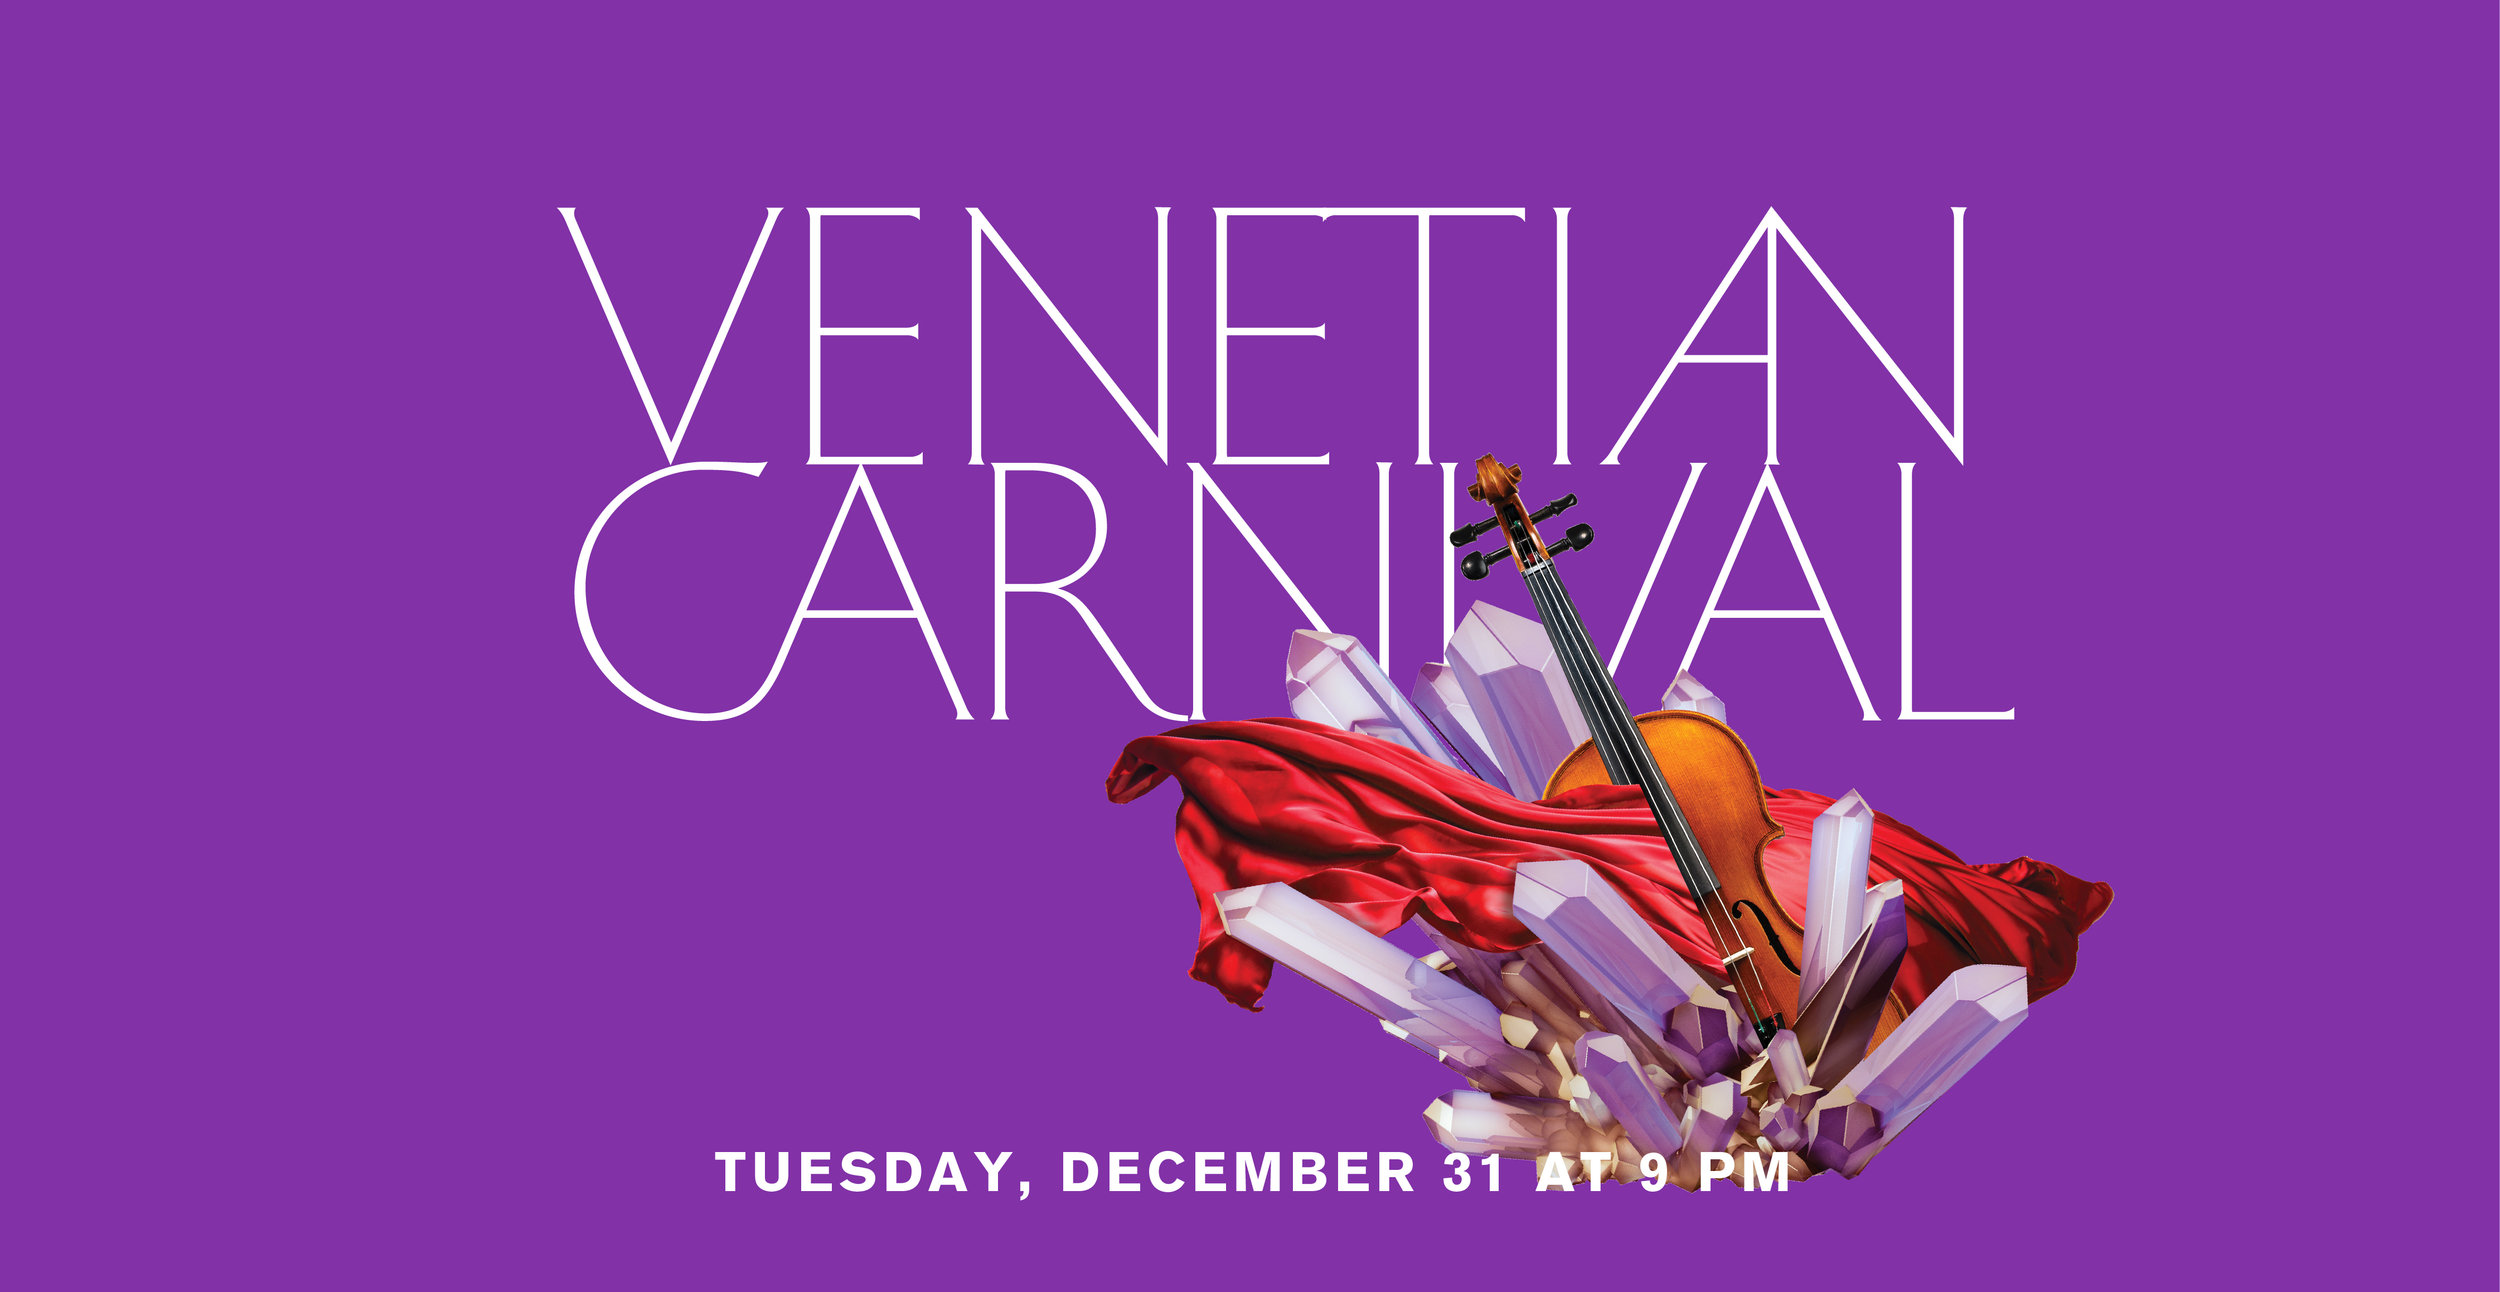 ALH-03 Venetian Carnival 1040x540.jpg